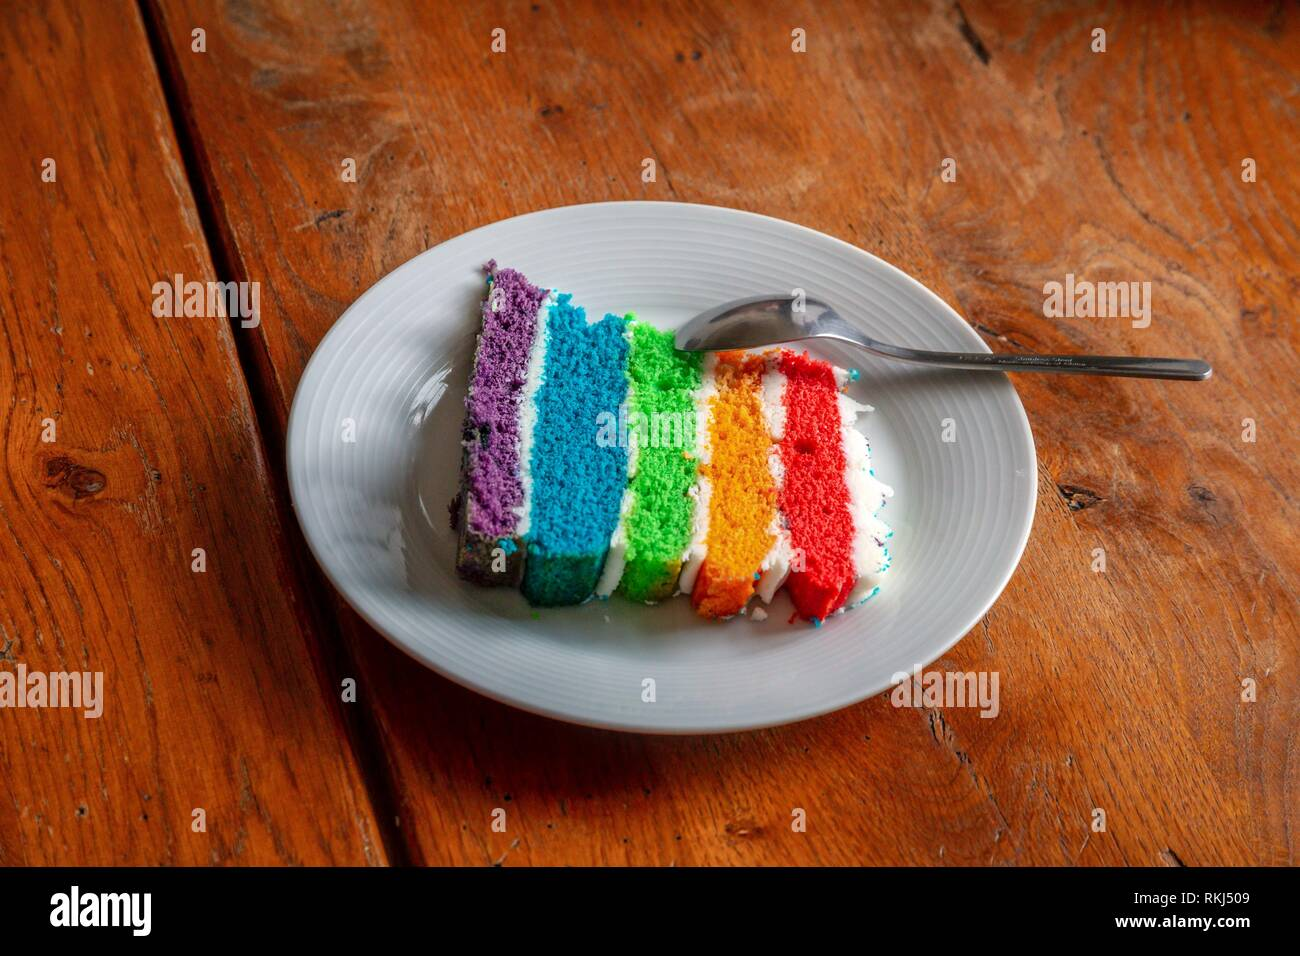 A slice of multi layered rainbow cake. - Stock Image